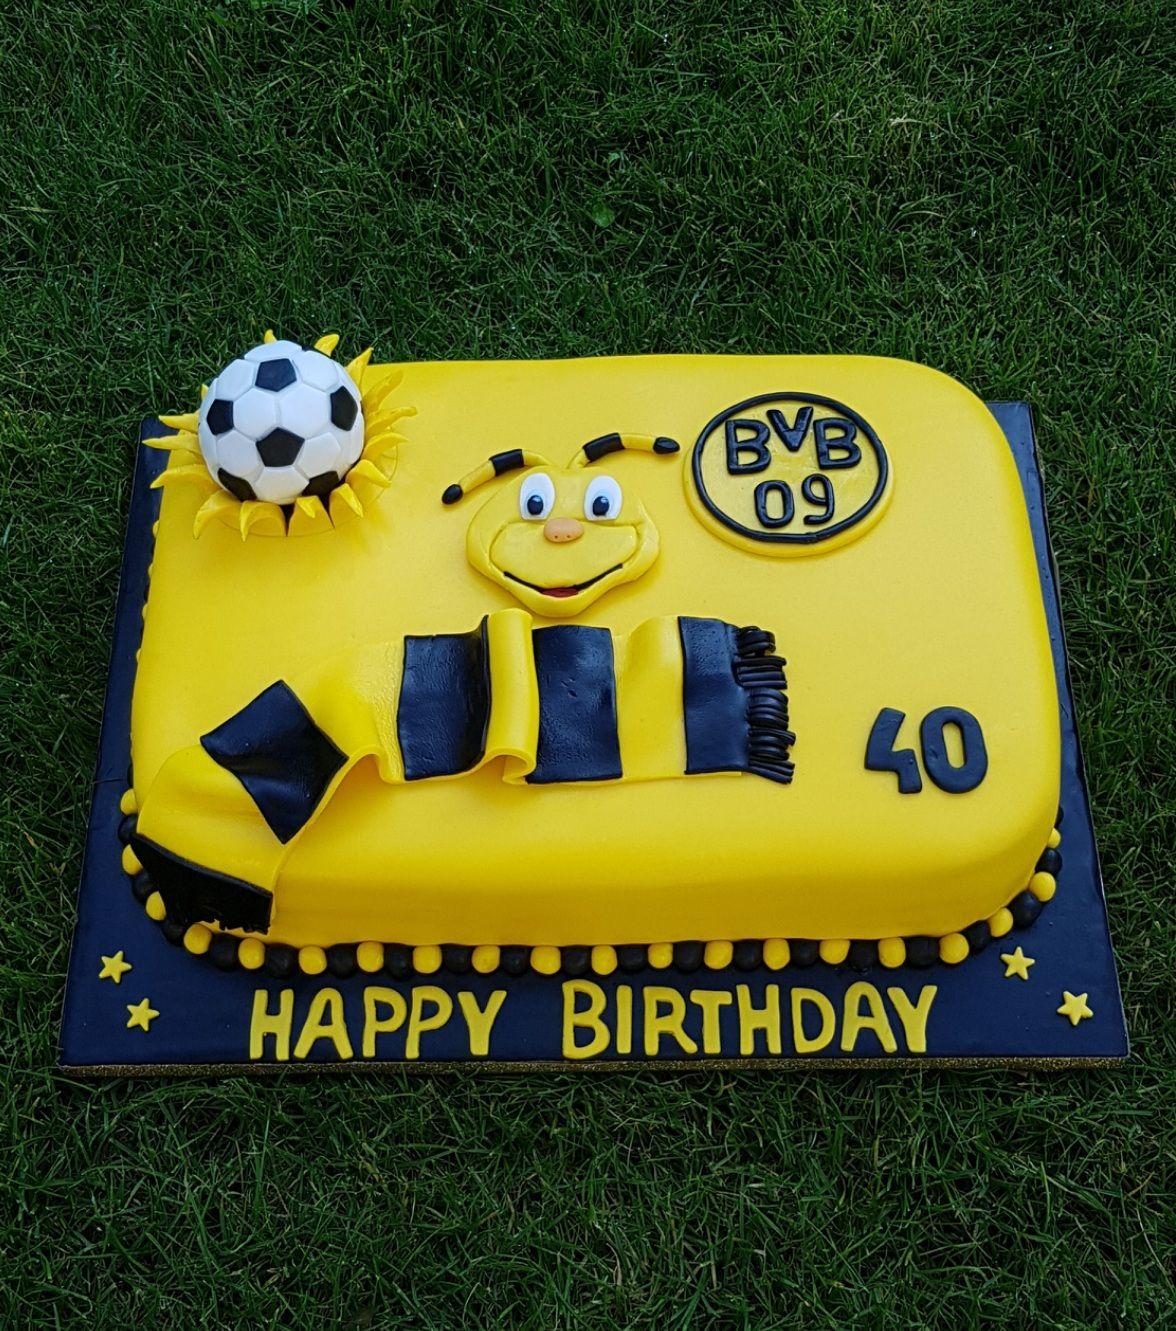 Bvb Geburtstag Torte Bvb Torte Bvb Geburtstag Motivtorte Geburtstag